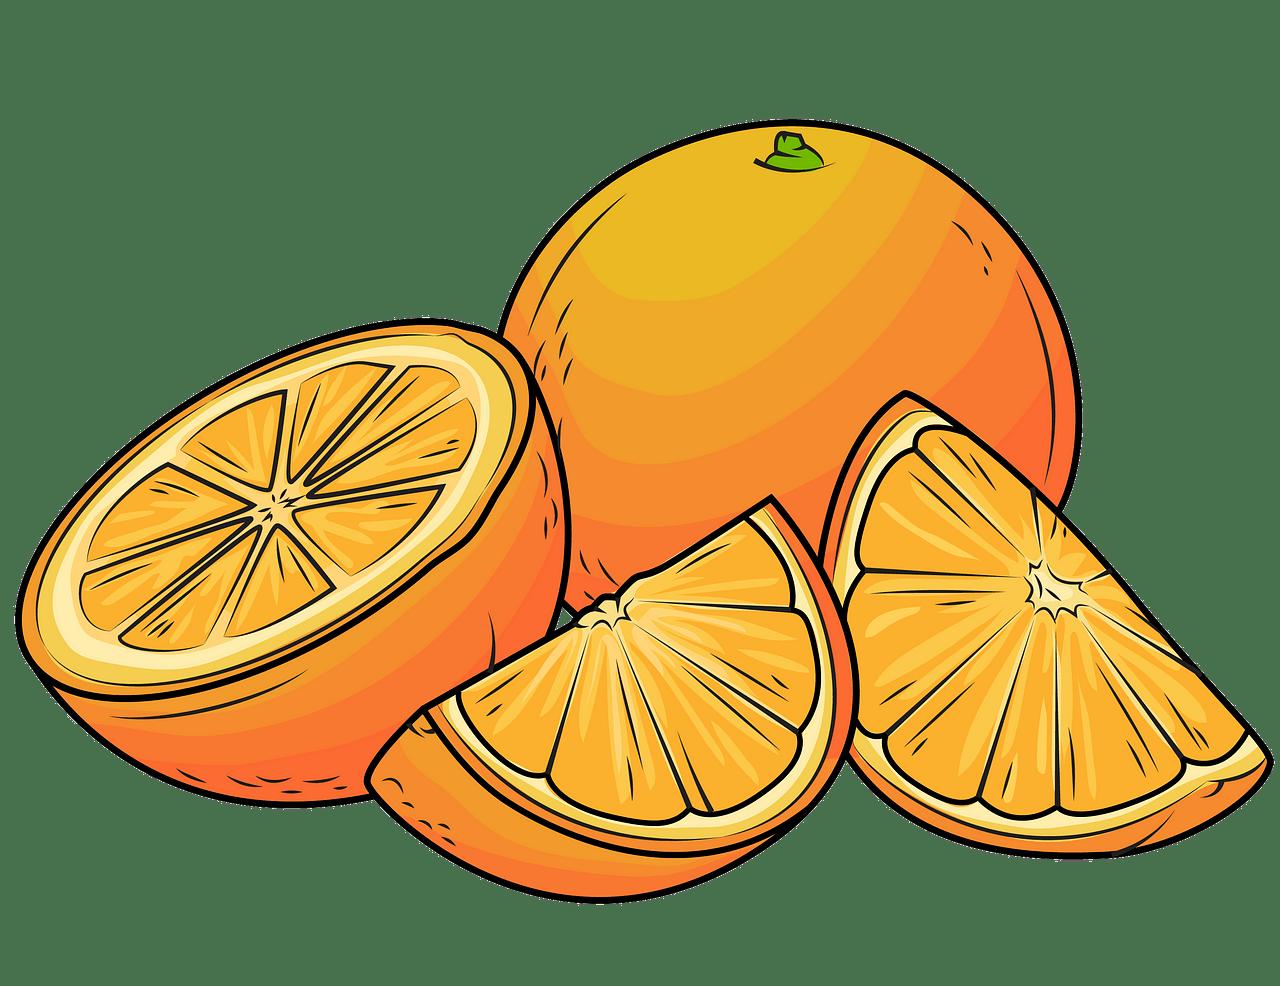 jpg library library Oranges clipart. Free download creazilla